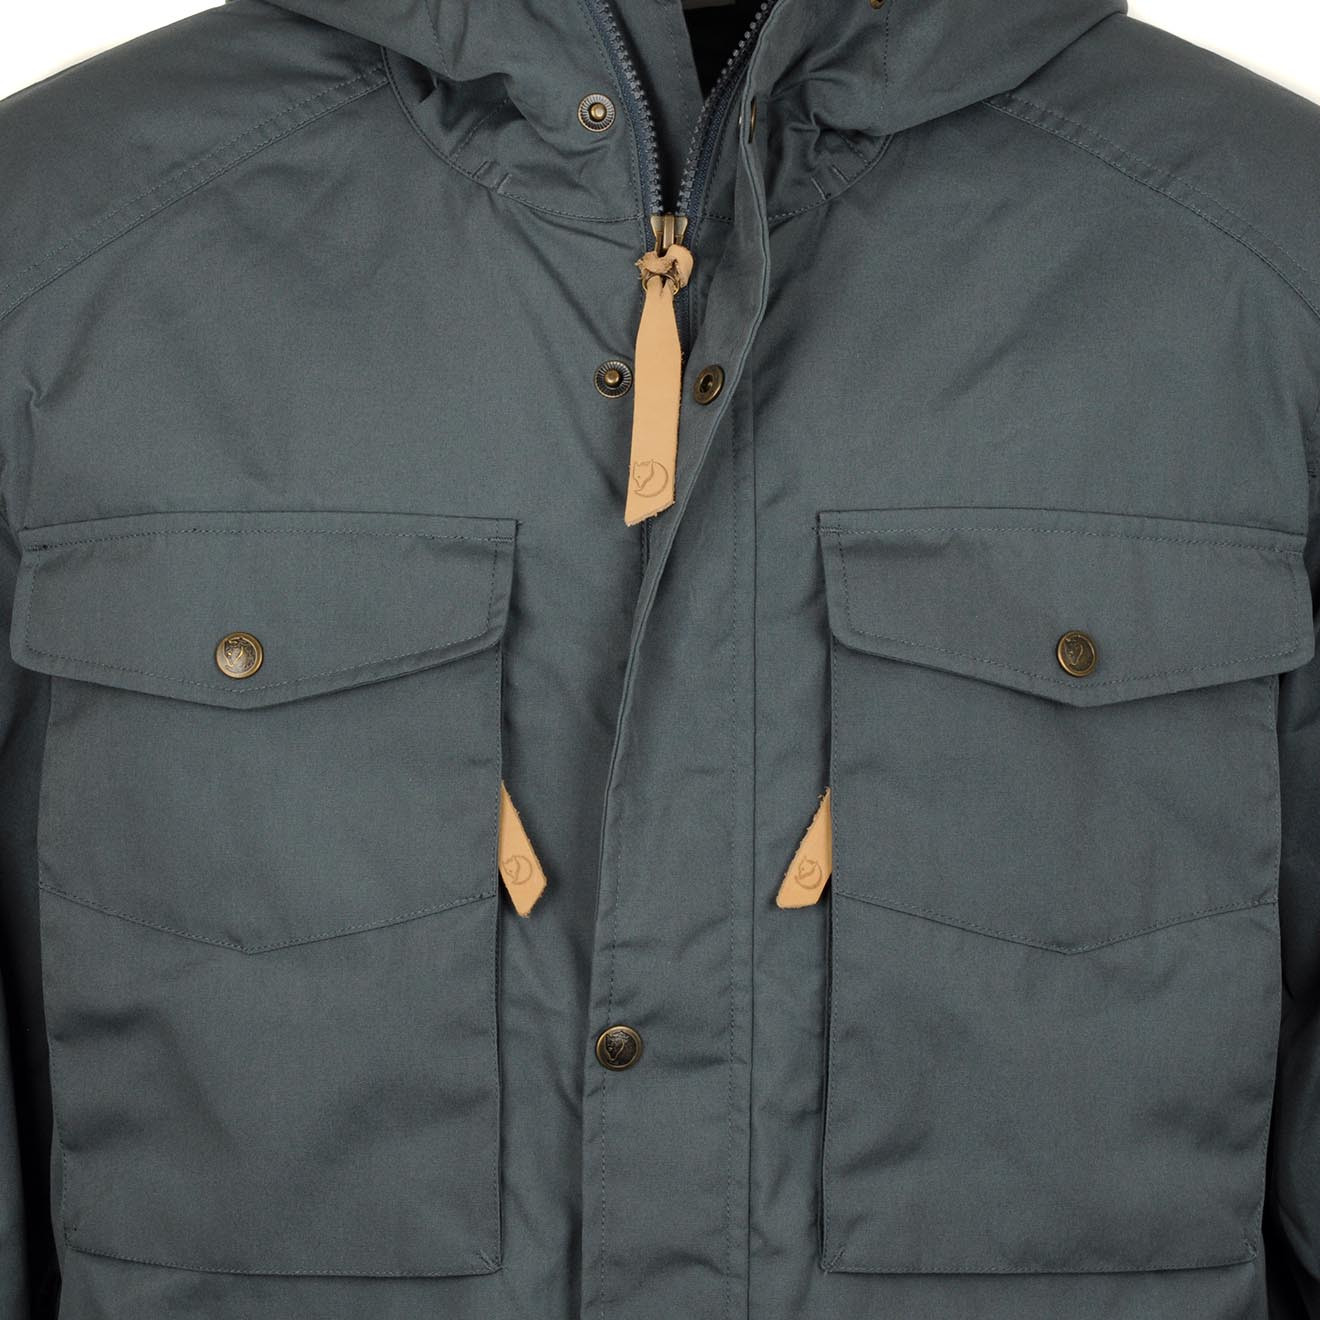 Fjallraven Singi Trekking Jacket Dusk - The Sporting Lodge 1da326f4c95f4